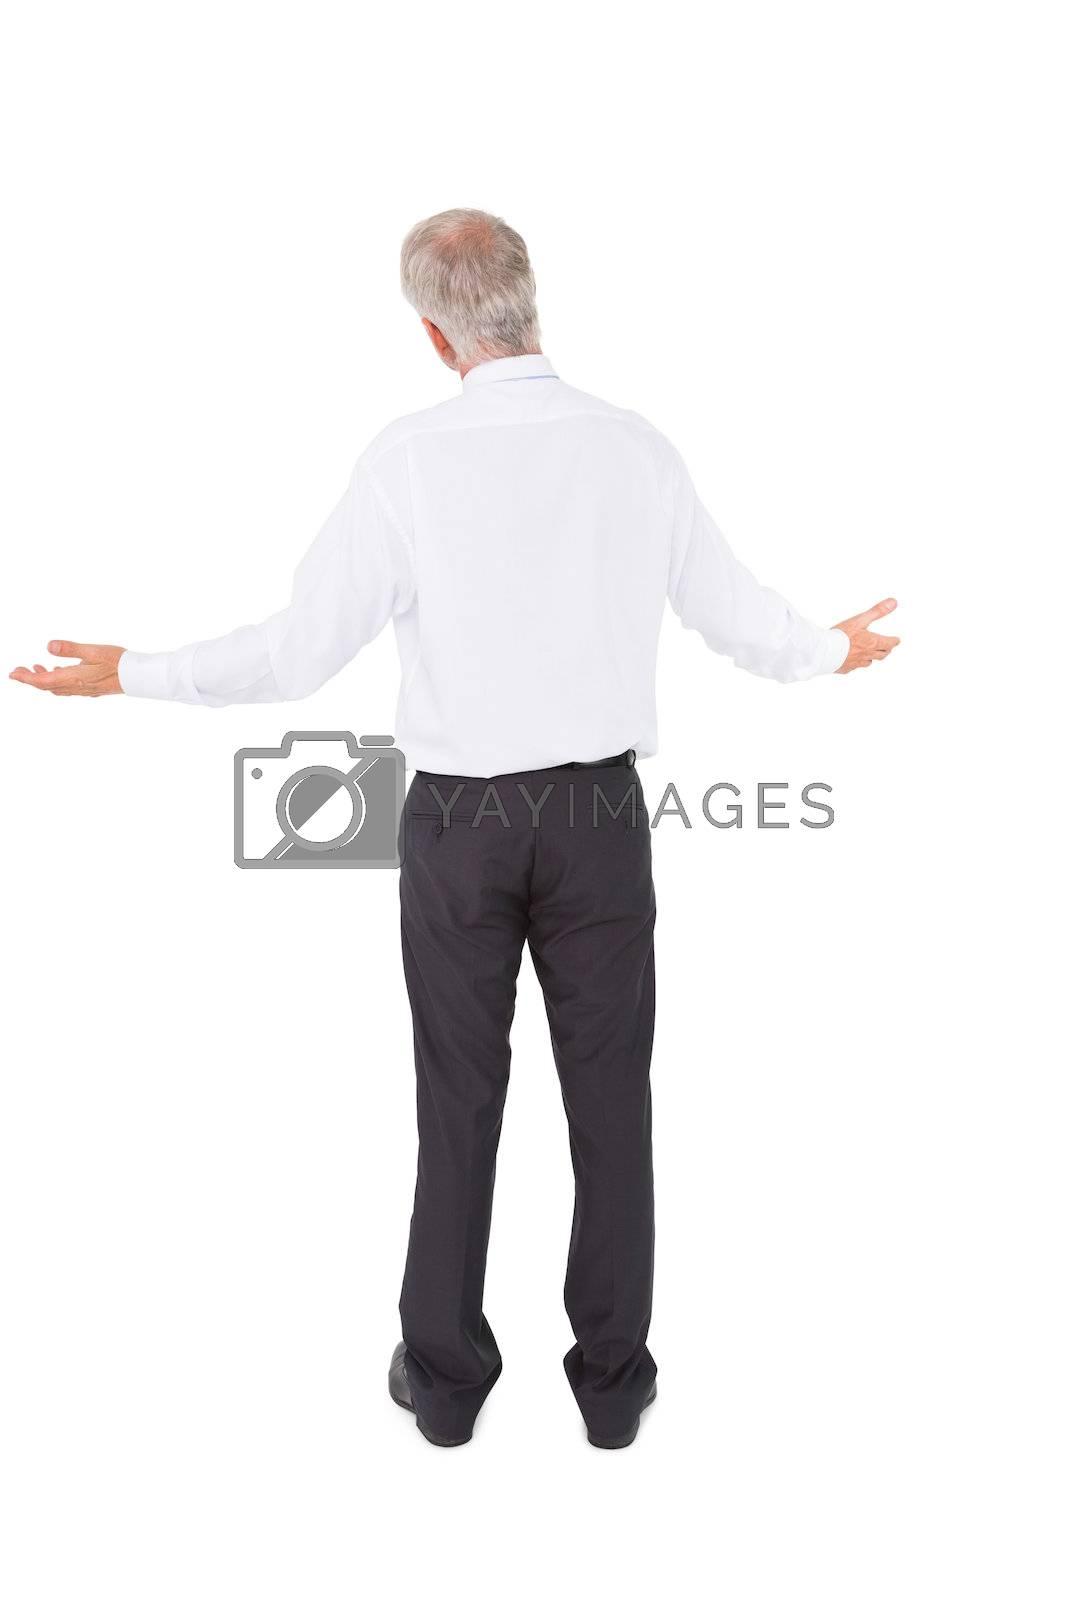 Rear view of surprised mature businessman posing by Wavebreakmedia